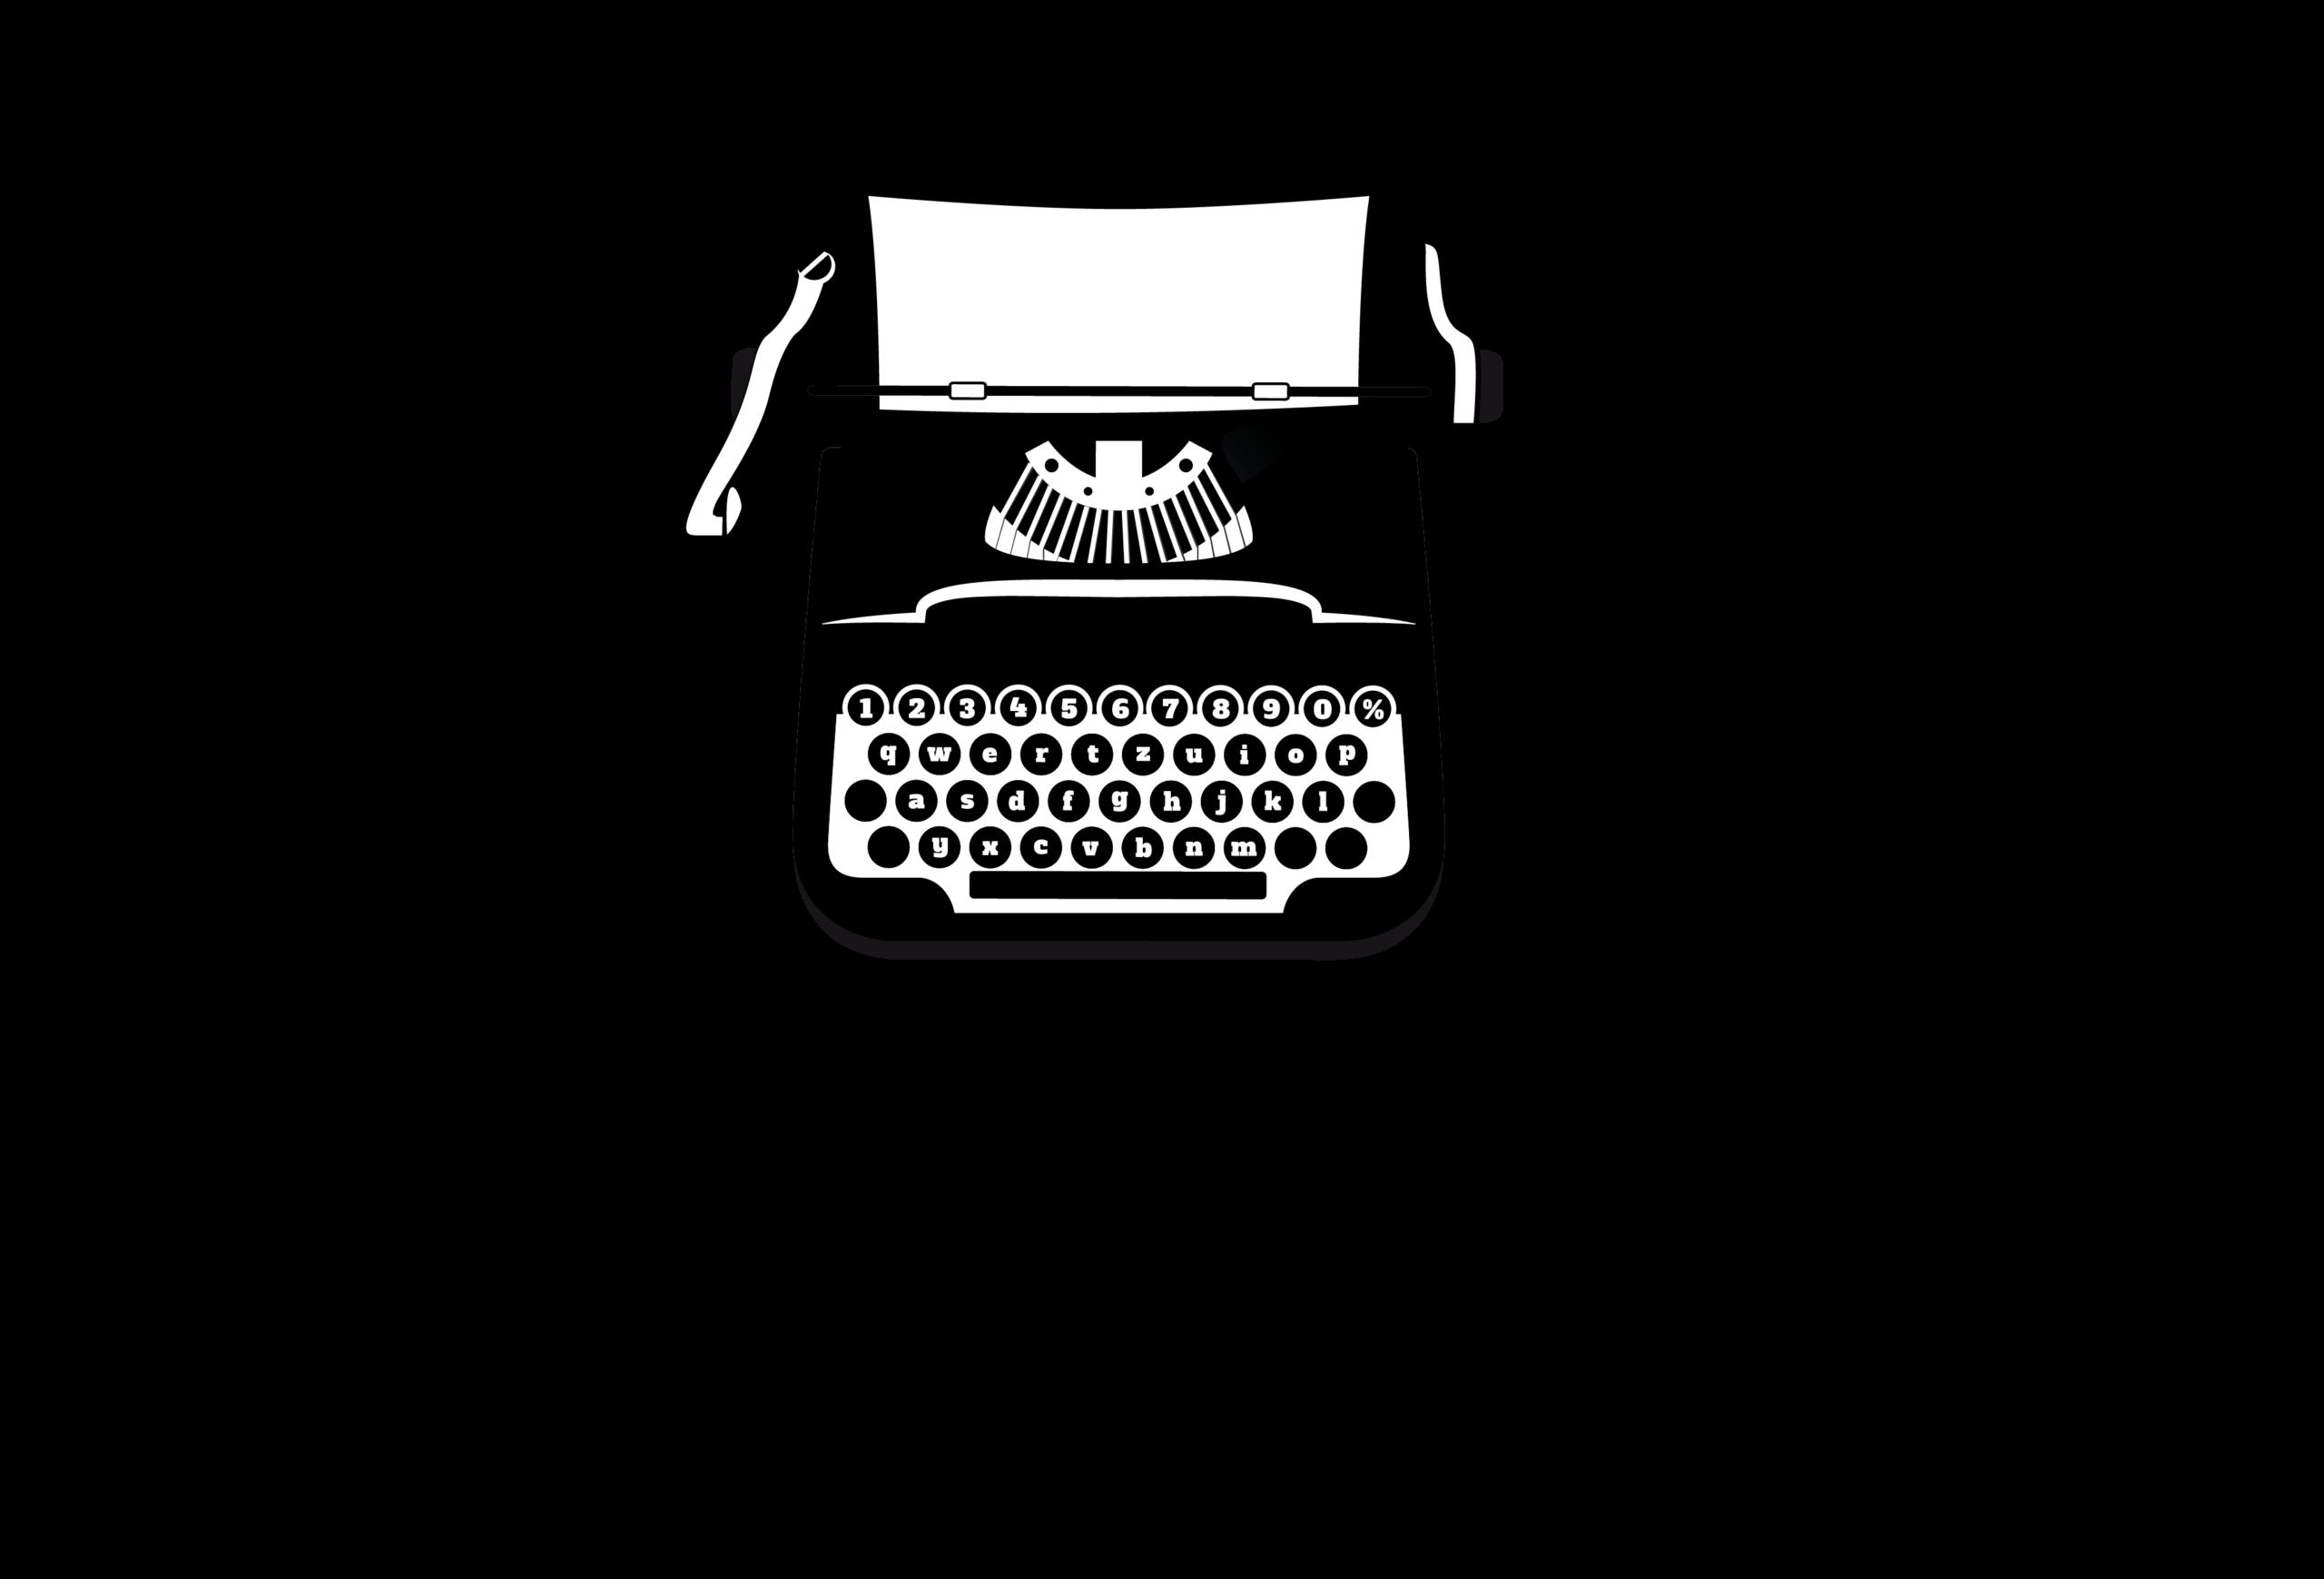 Logo-Editorial Letra Minúscula-negro-fondo-transparente